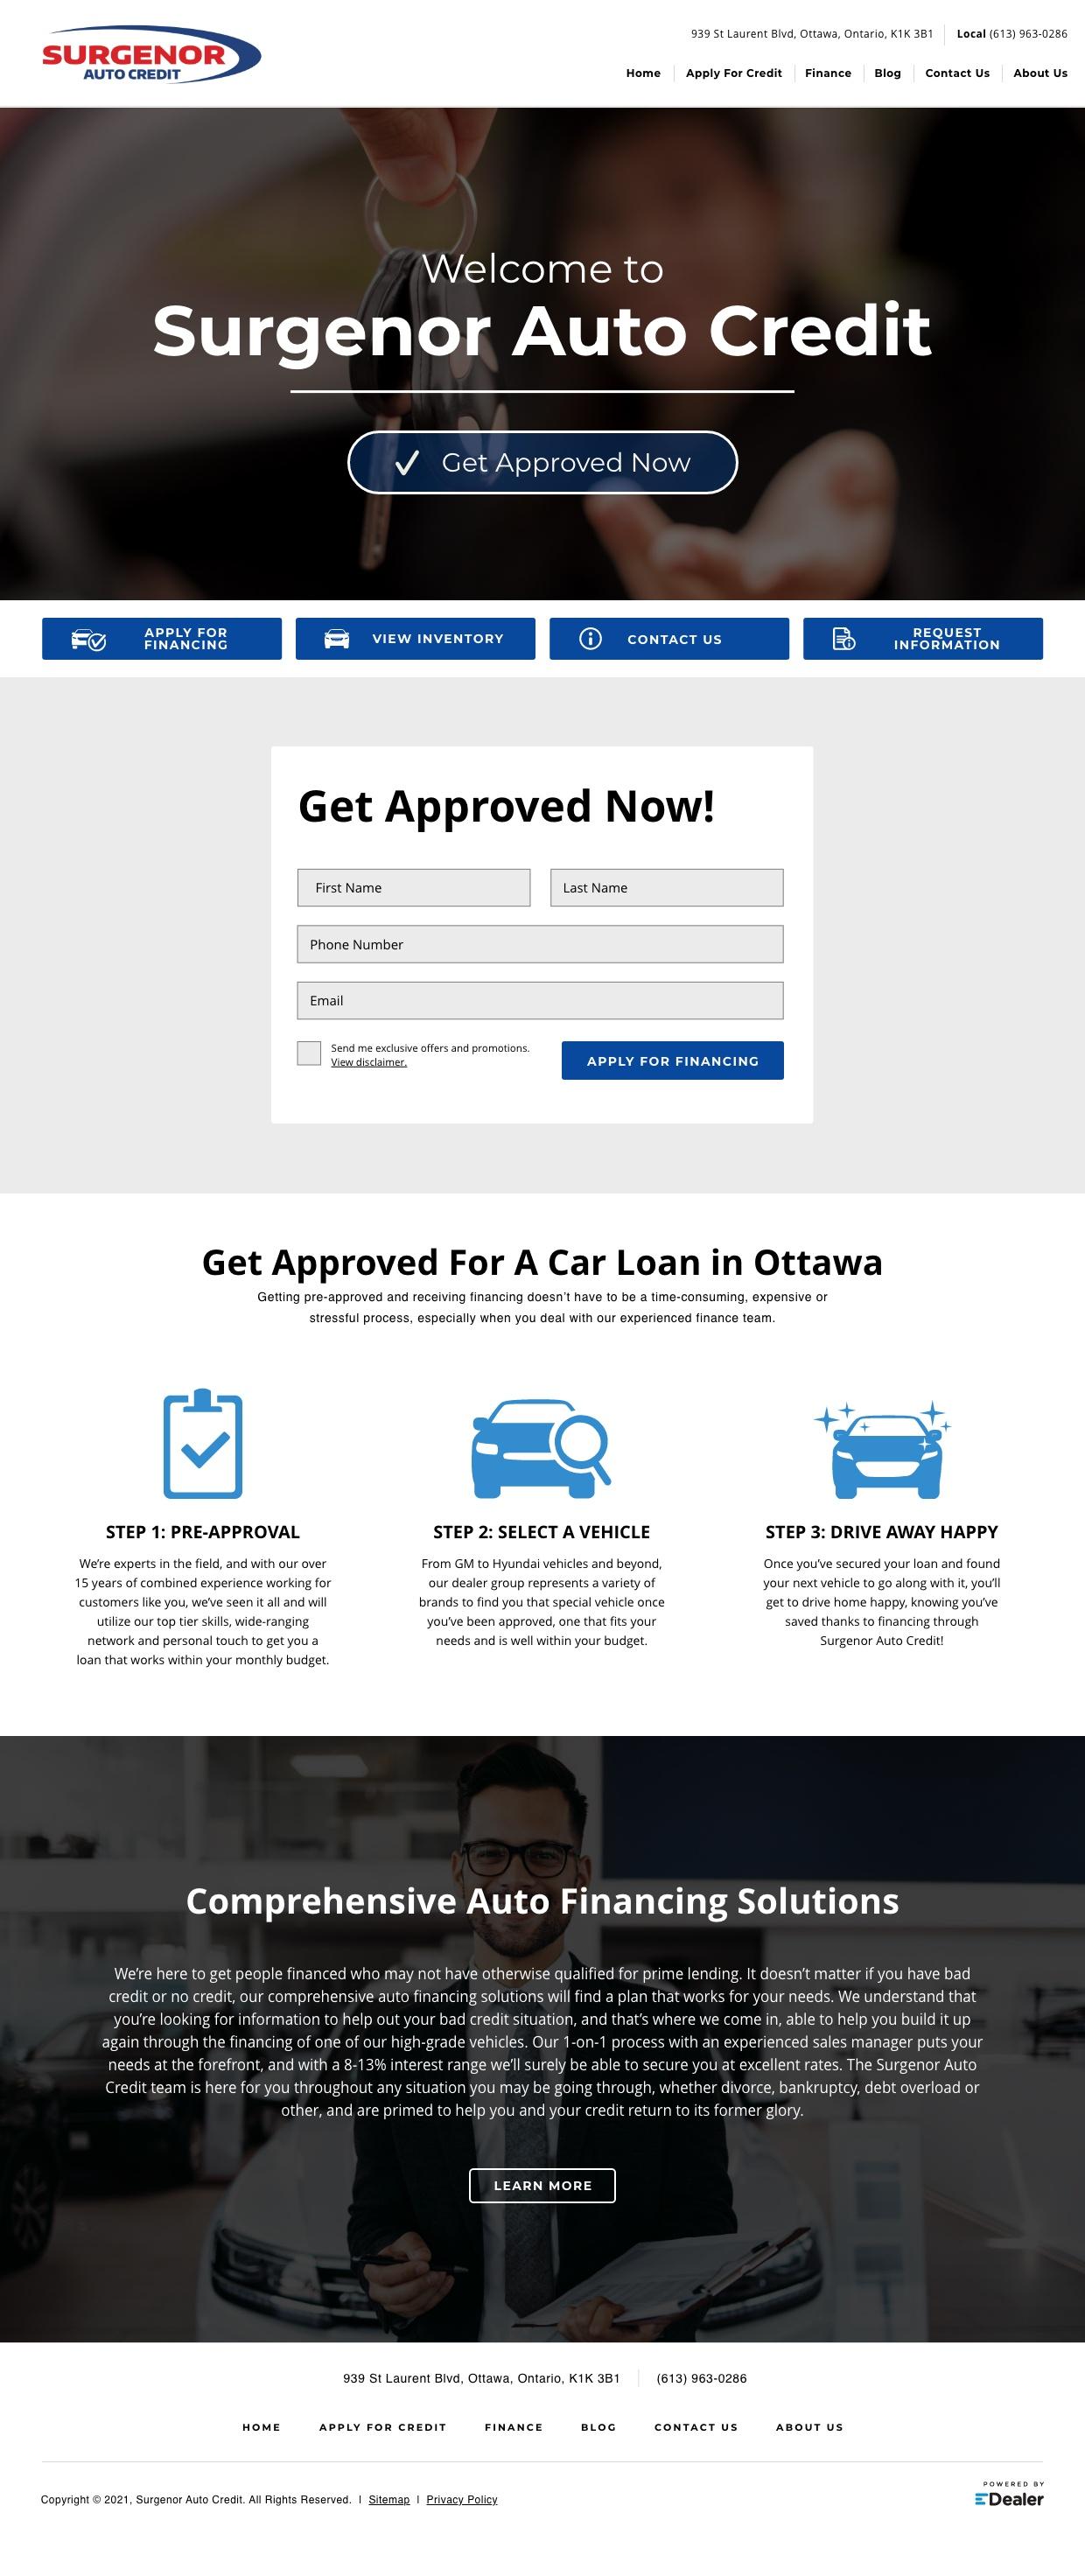 Surgenor Auto Credit